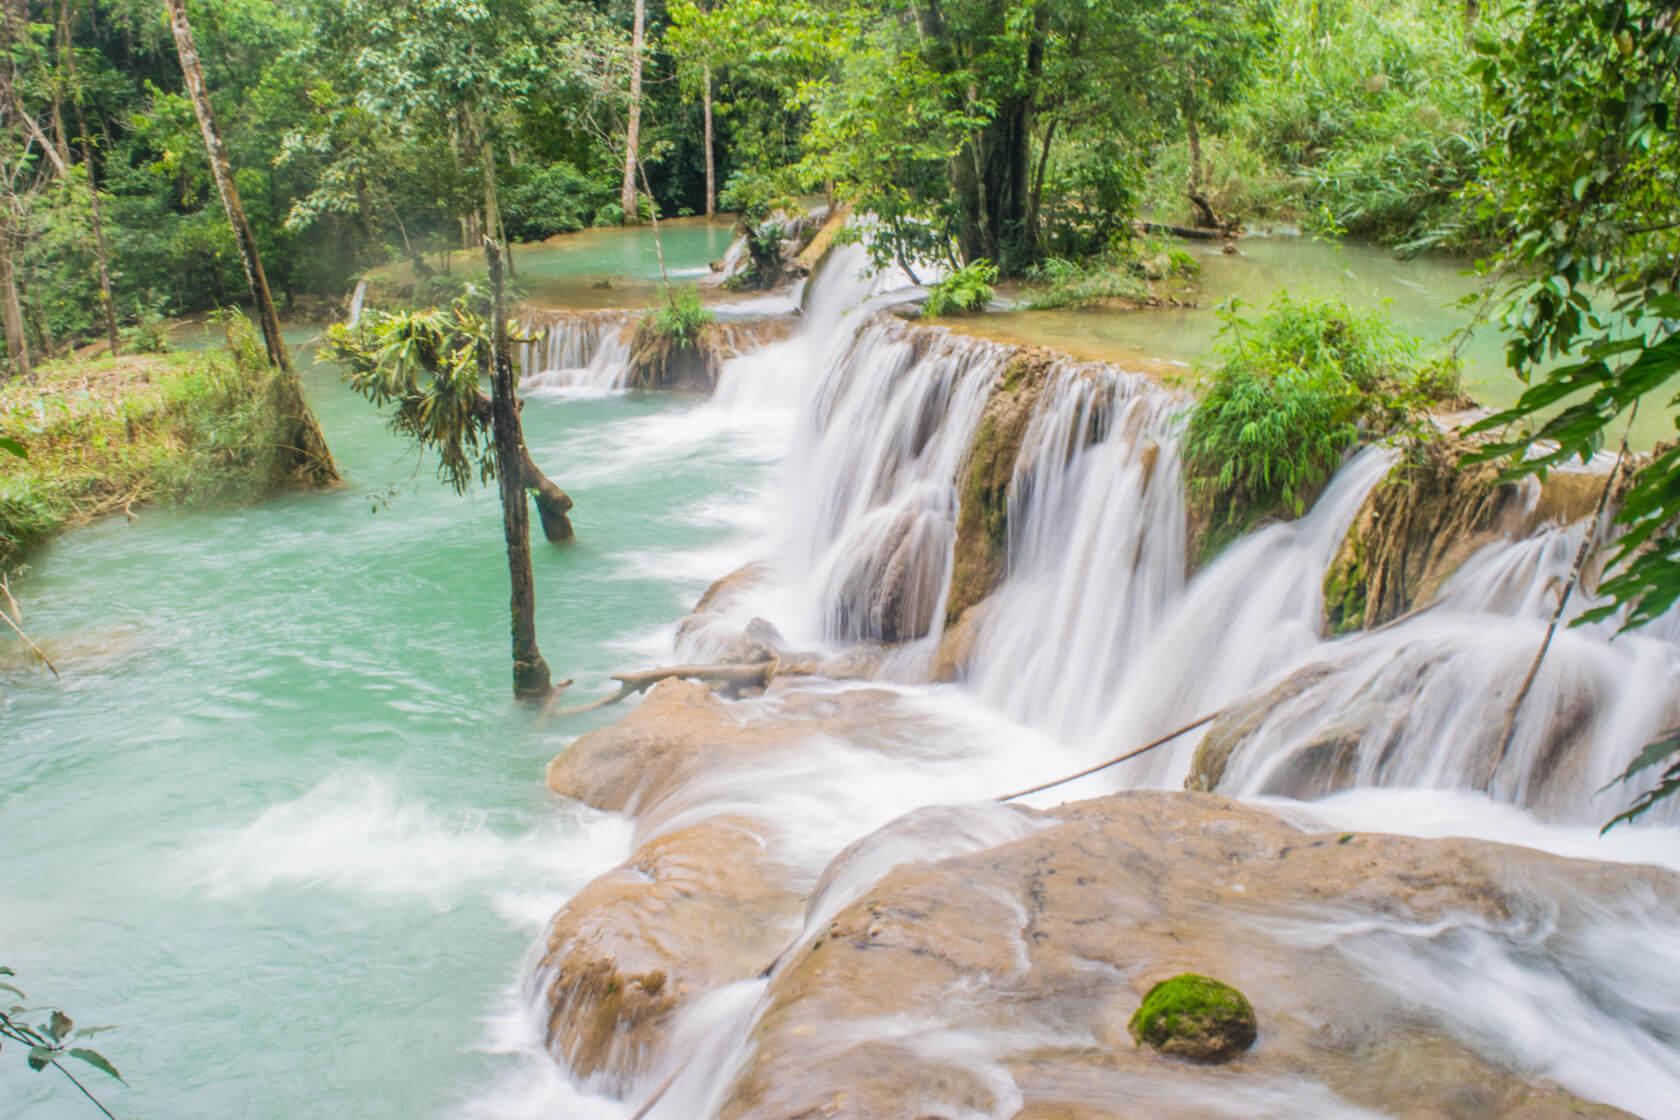 Laos waterfalls